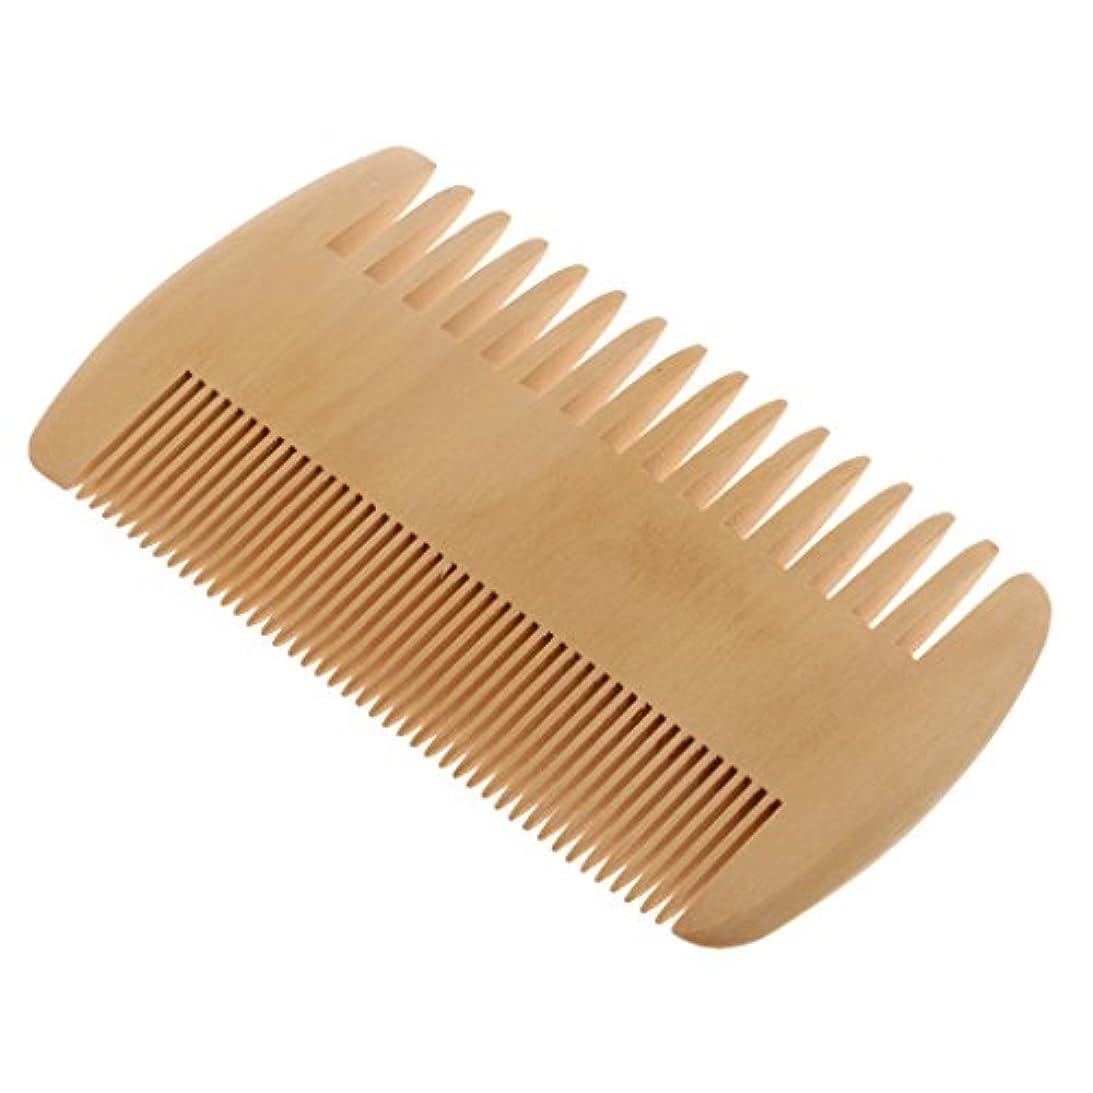 Toygogo ヘアコーム 木製コーム 木製櫛 ポケットコーム マッサージの櫛 帯電防止 2倍 密度の歯